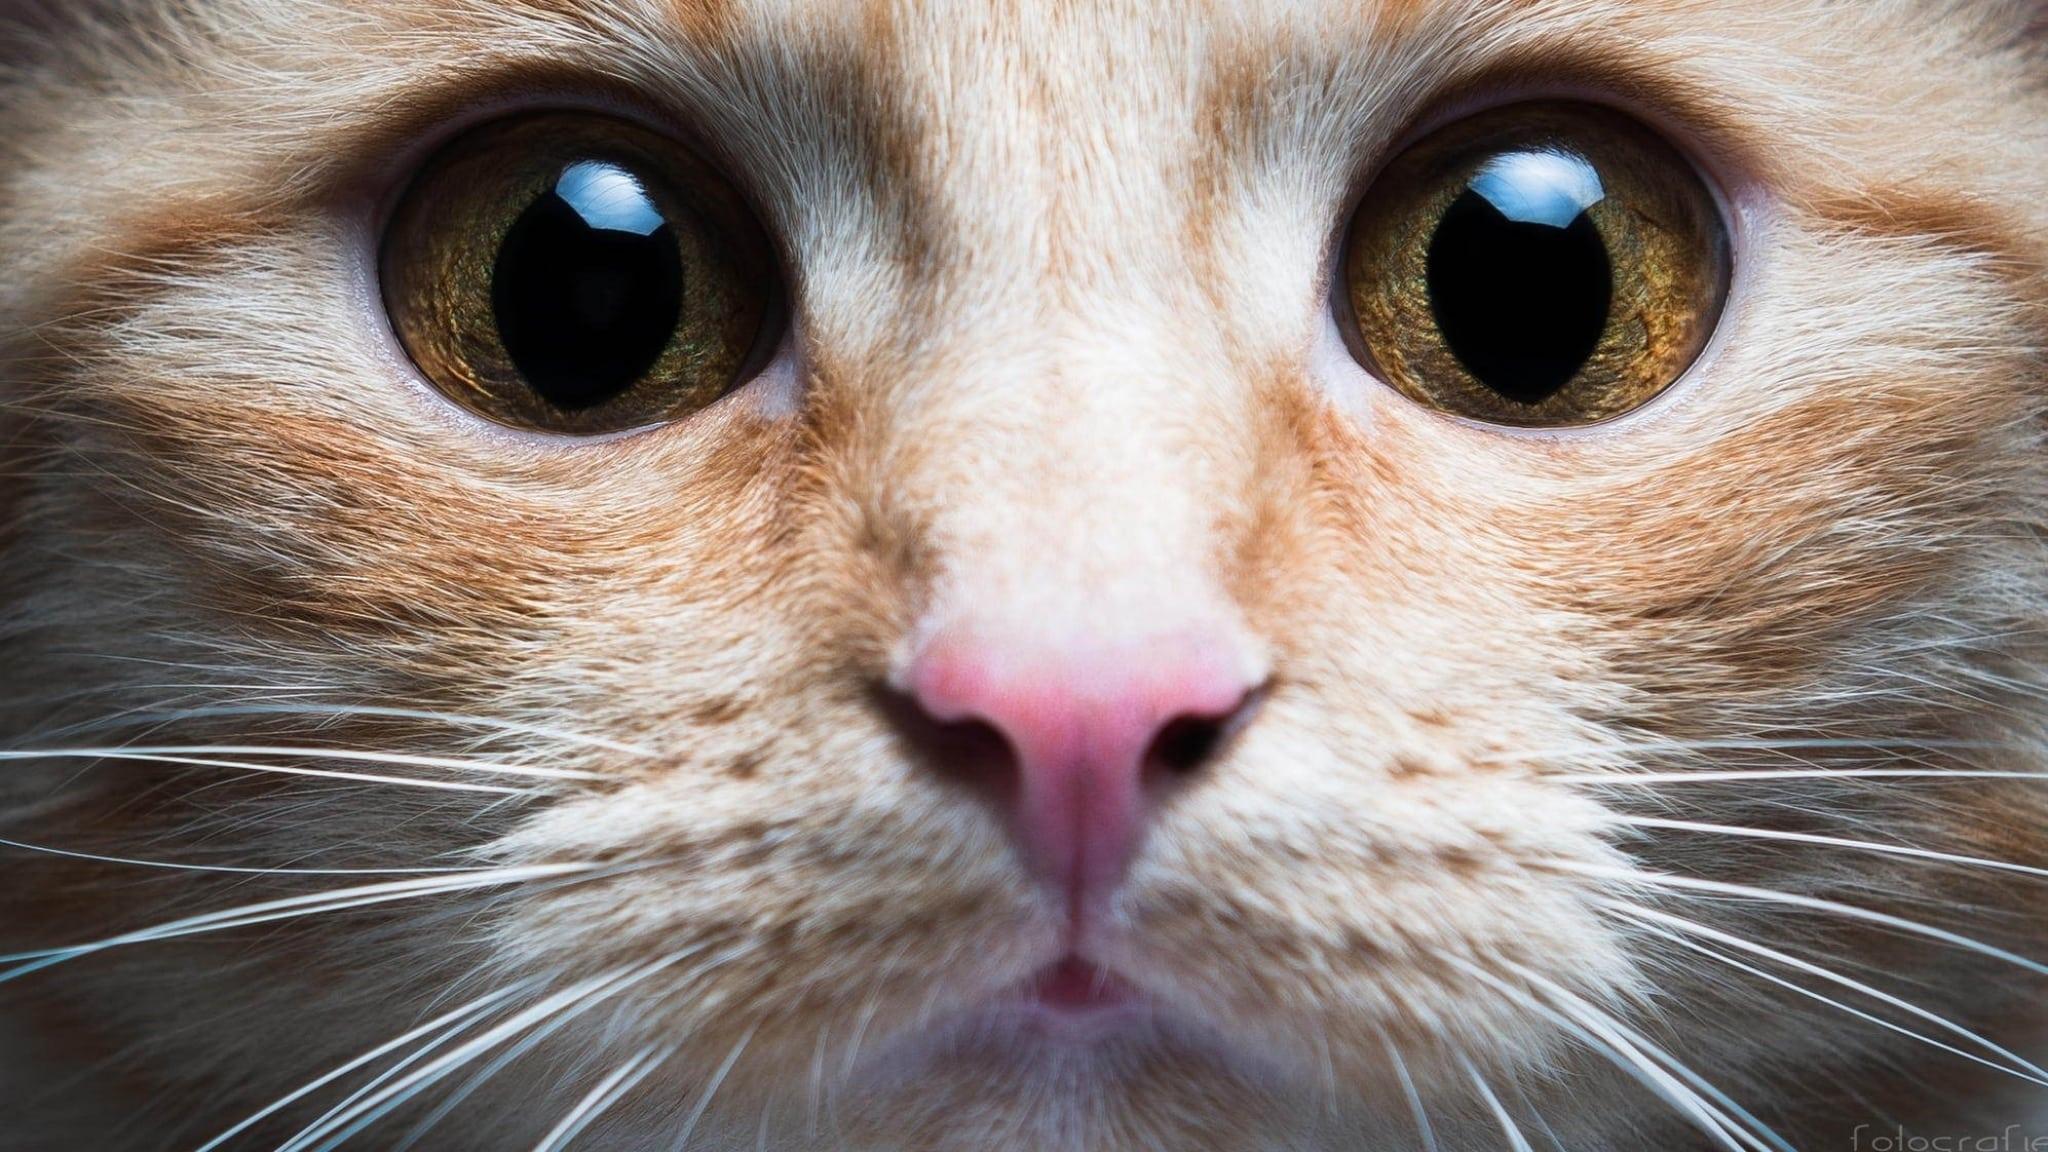 котята с карими глазами фото мессенджер